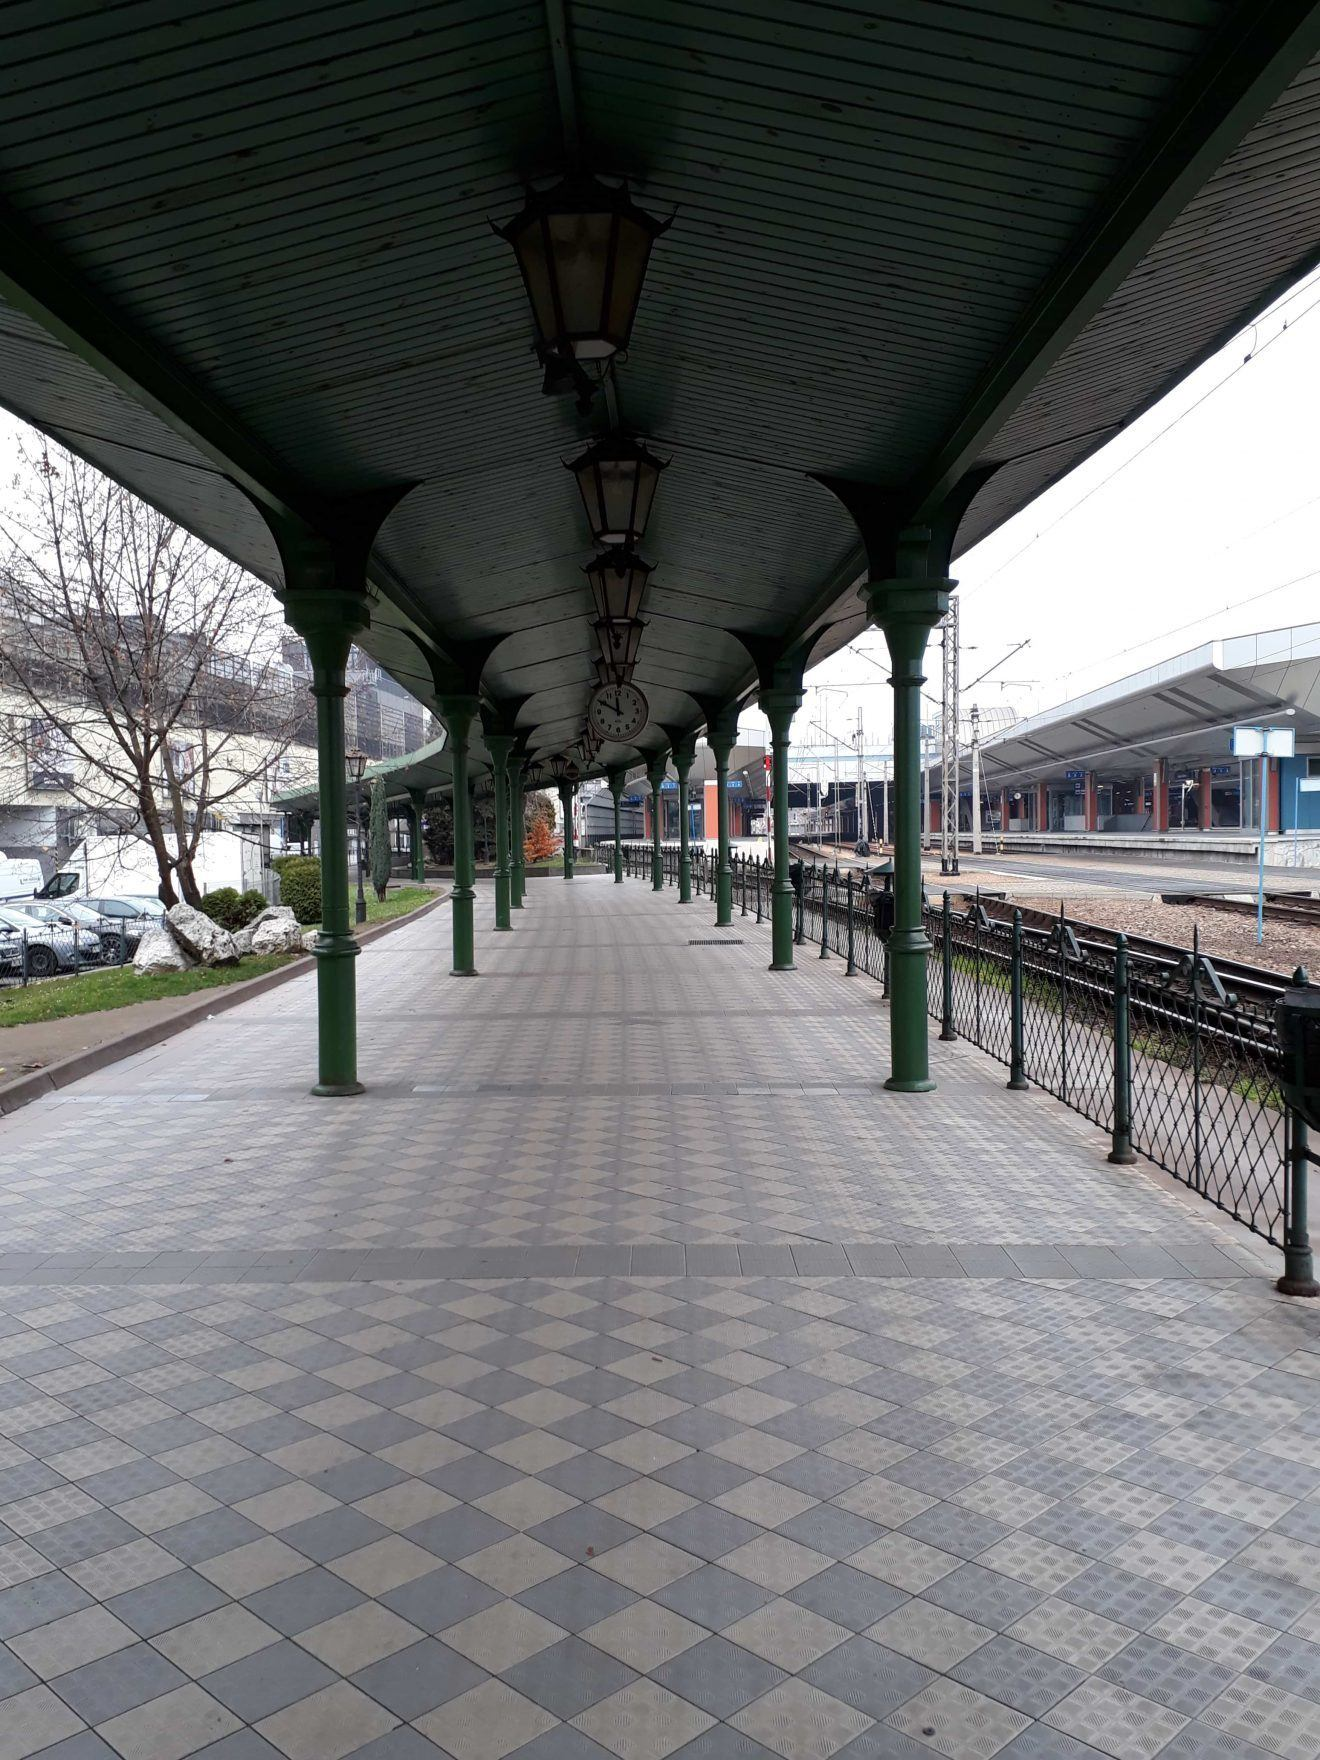 Kraków Główny secret entrance